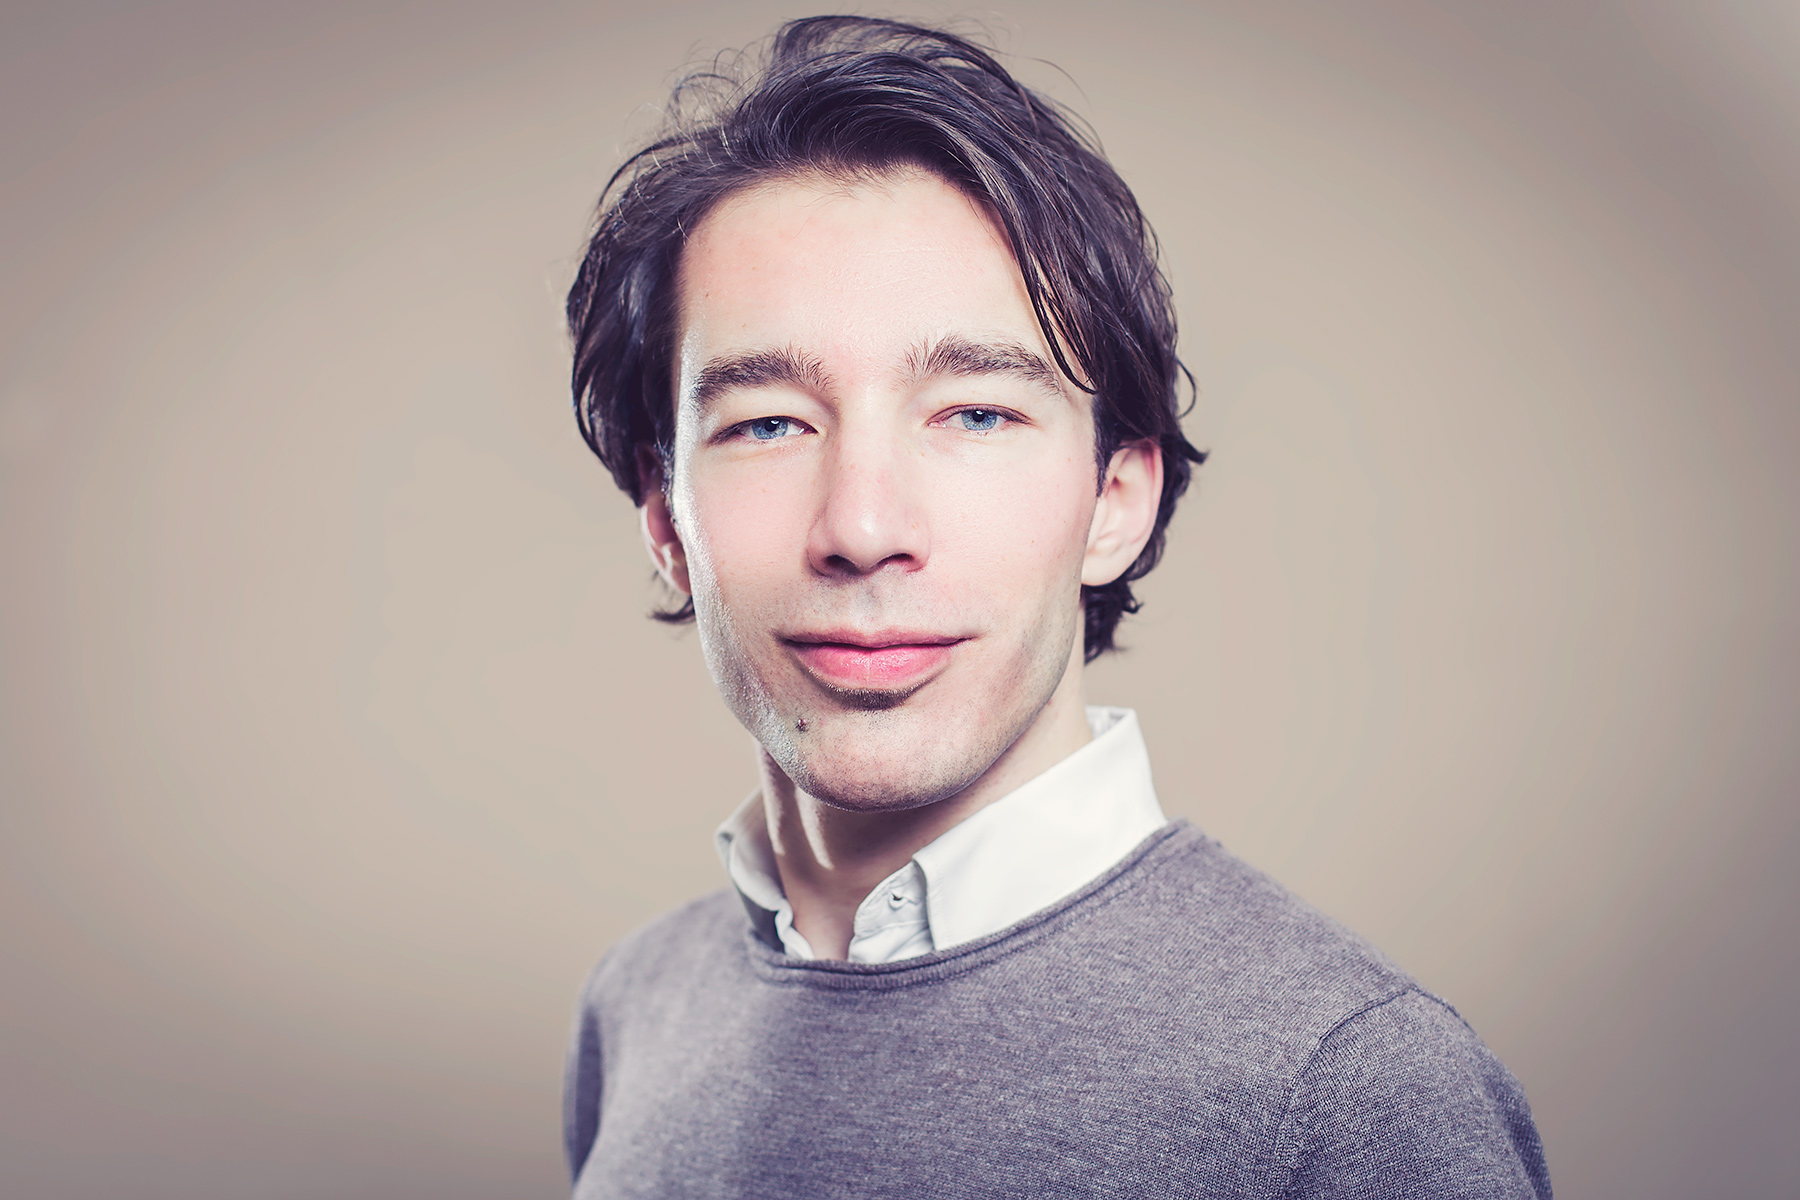 Portrait Headshot Bewerbung Apply